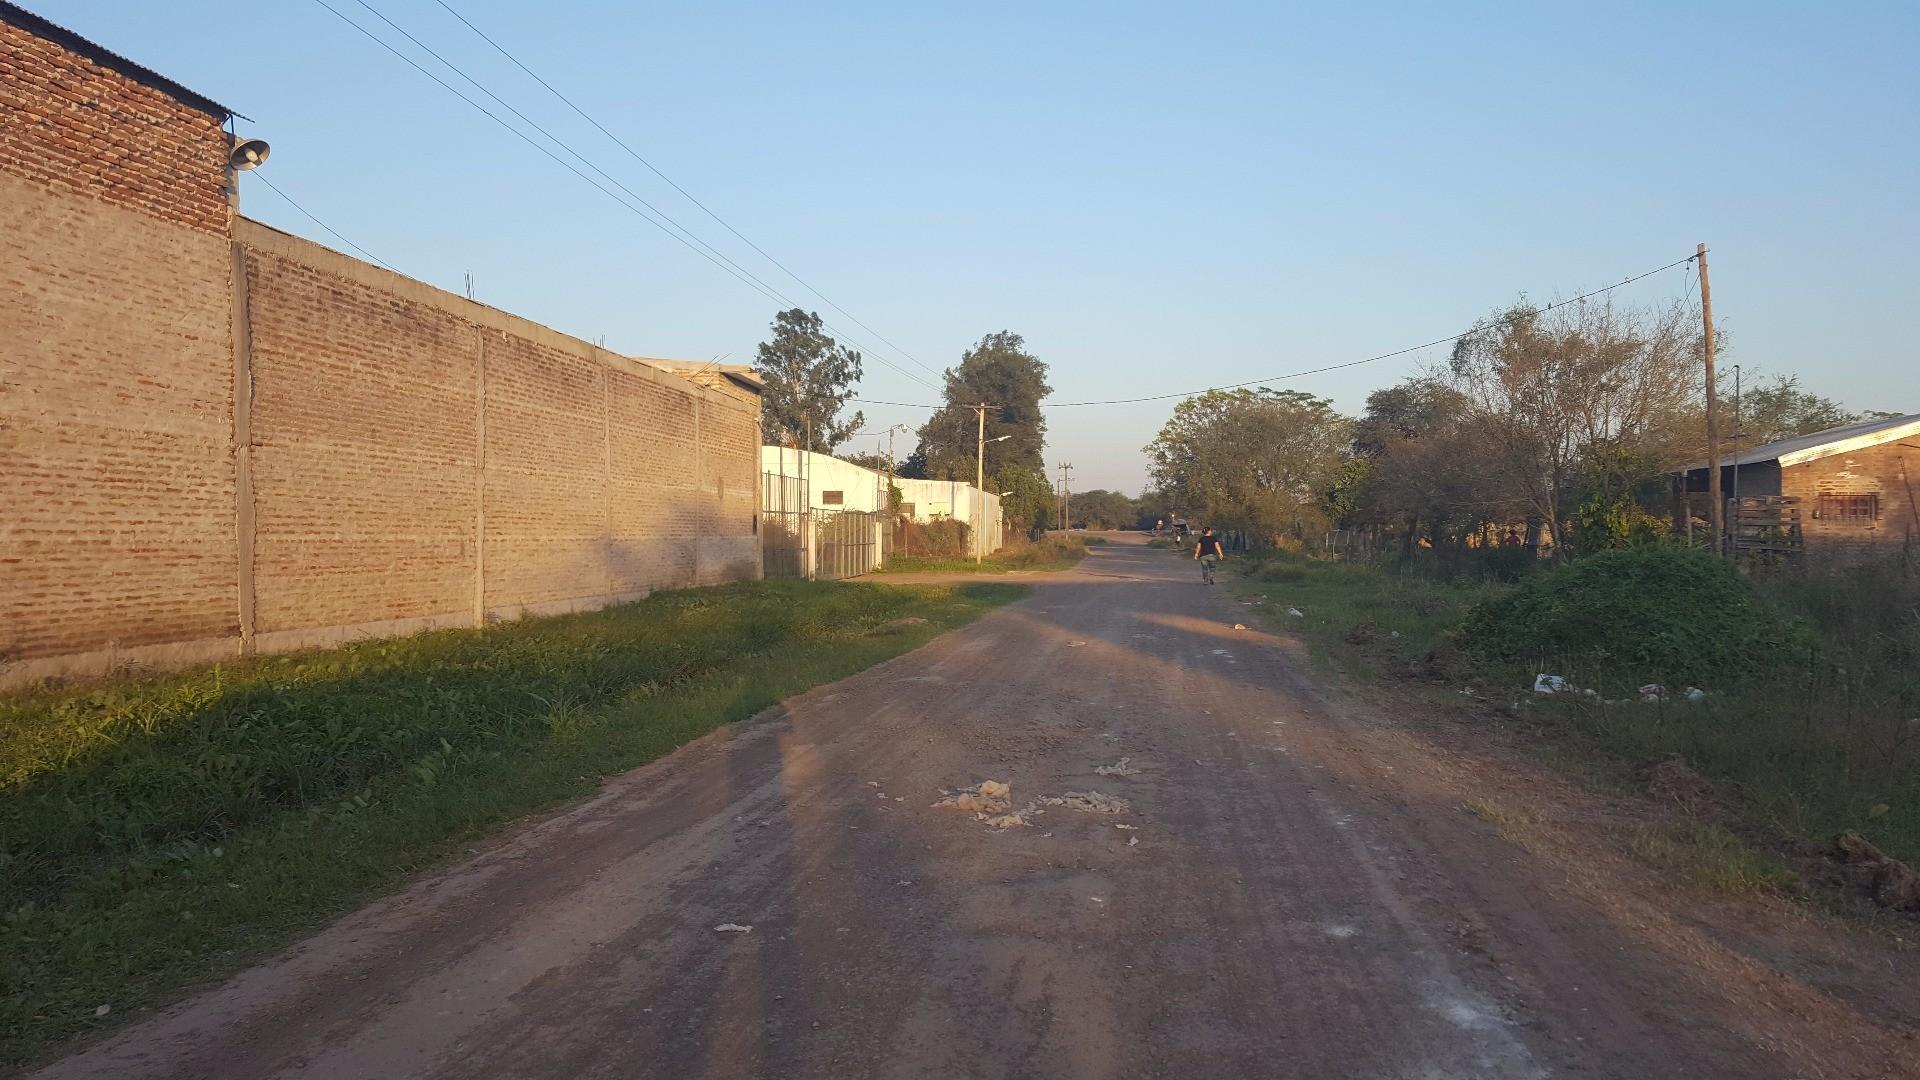 Terreno 10x40 a 120 mts. de Rta. 11 kM.1001 (entrada de Barrio Carpincho Macho) 0362-154826003